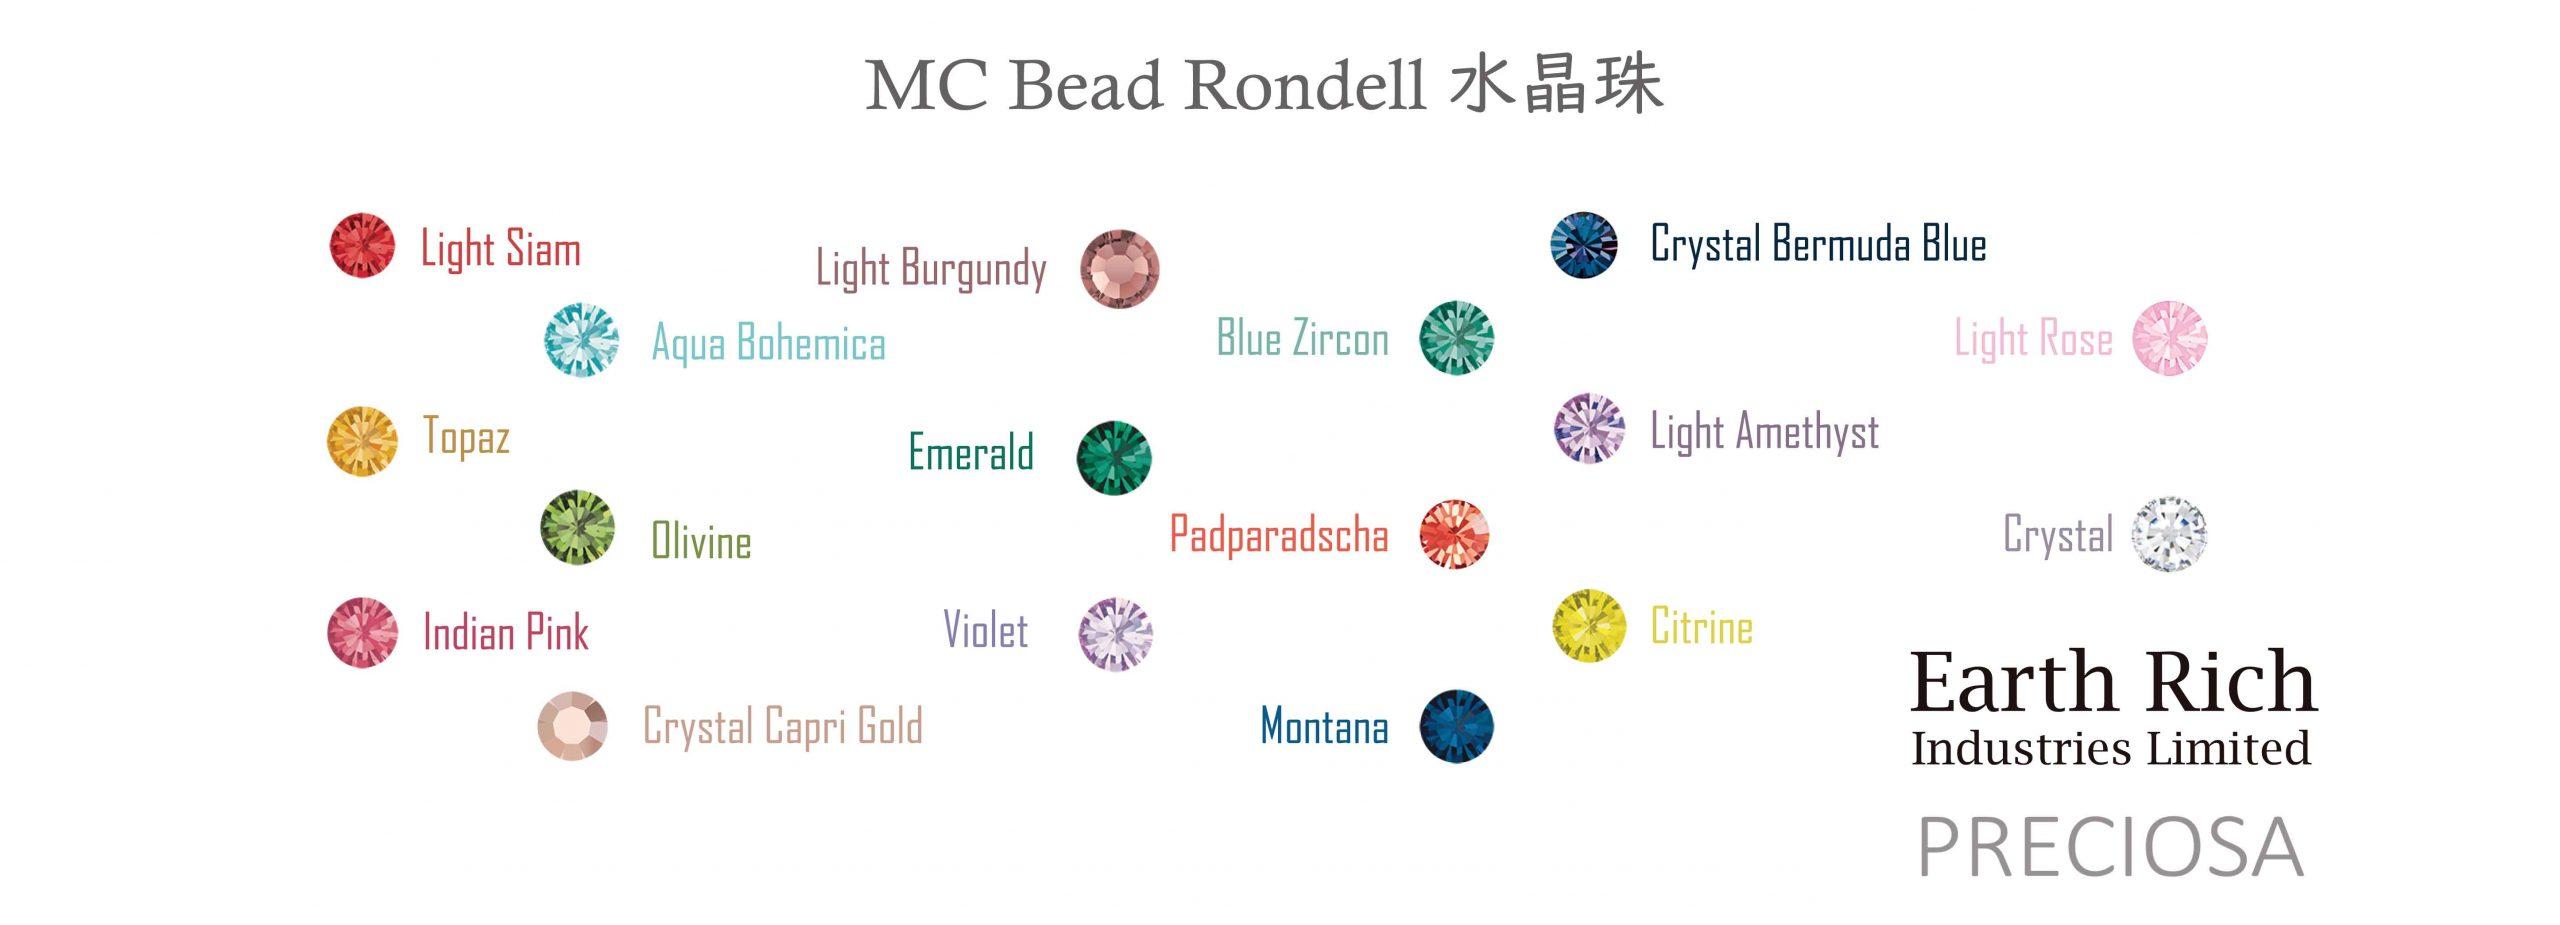 Rondell 水晶珠banner